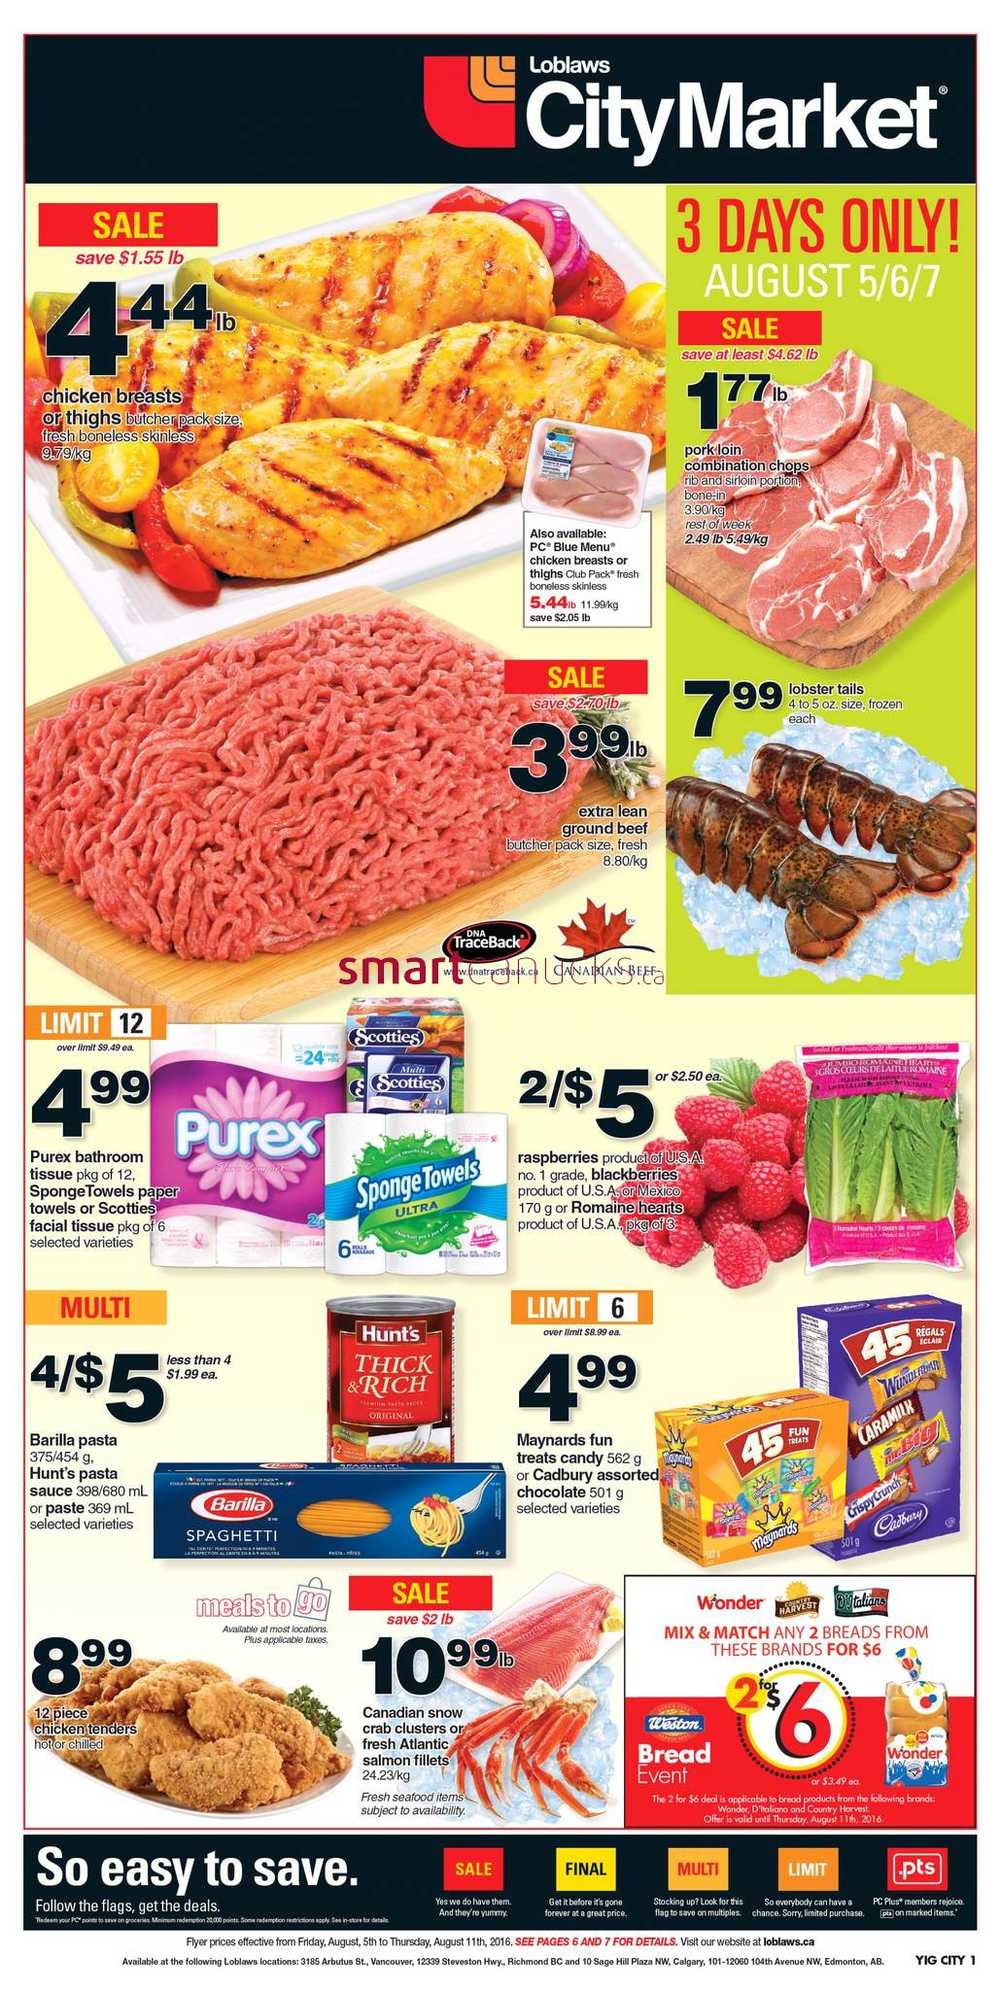 City market coupons